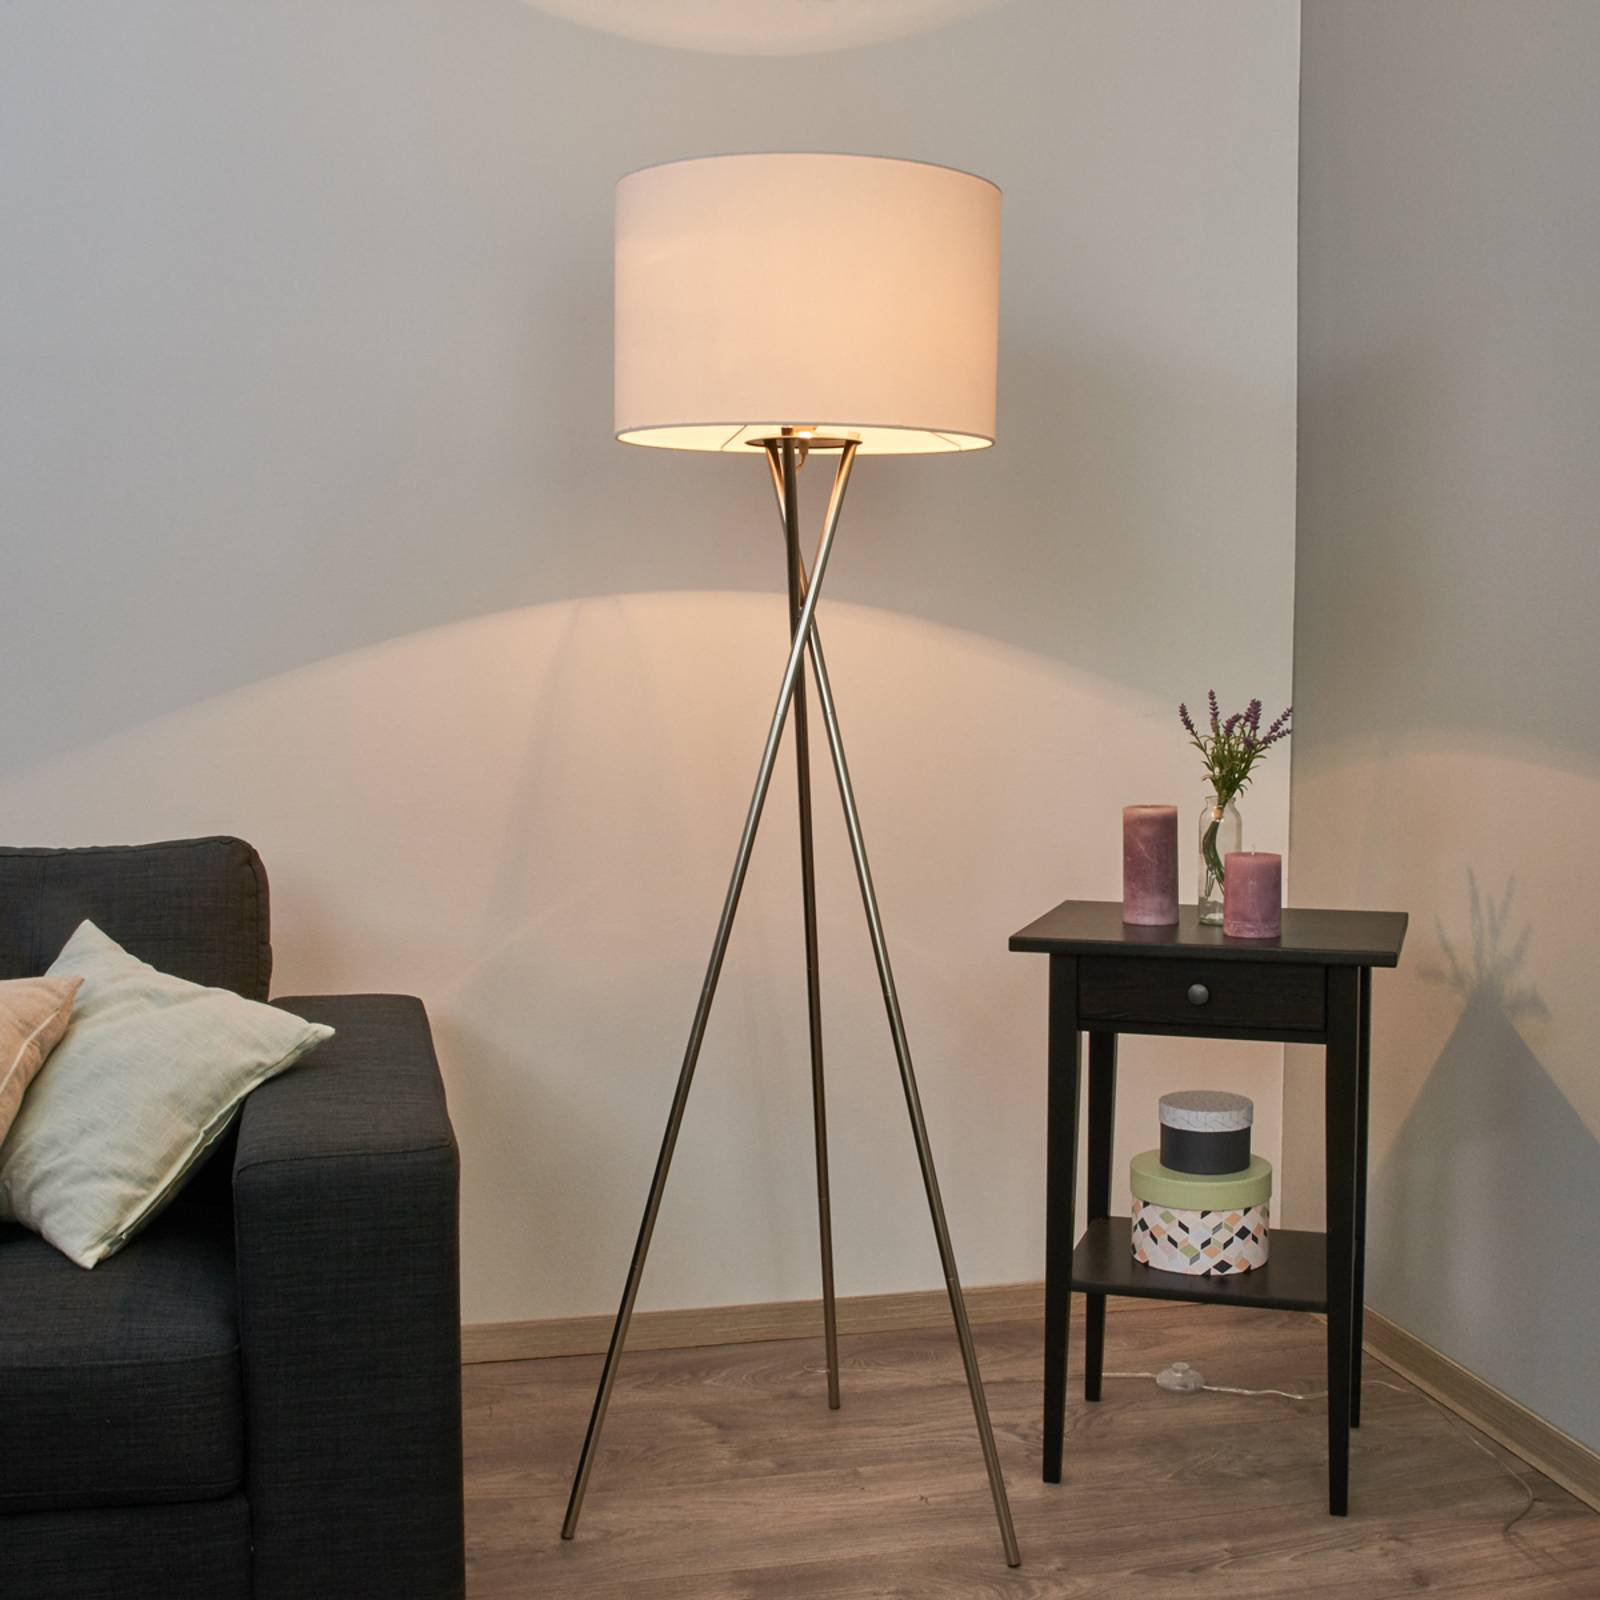 Trefots stålampe Fiby med hvit stoffskjerm